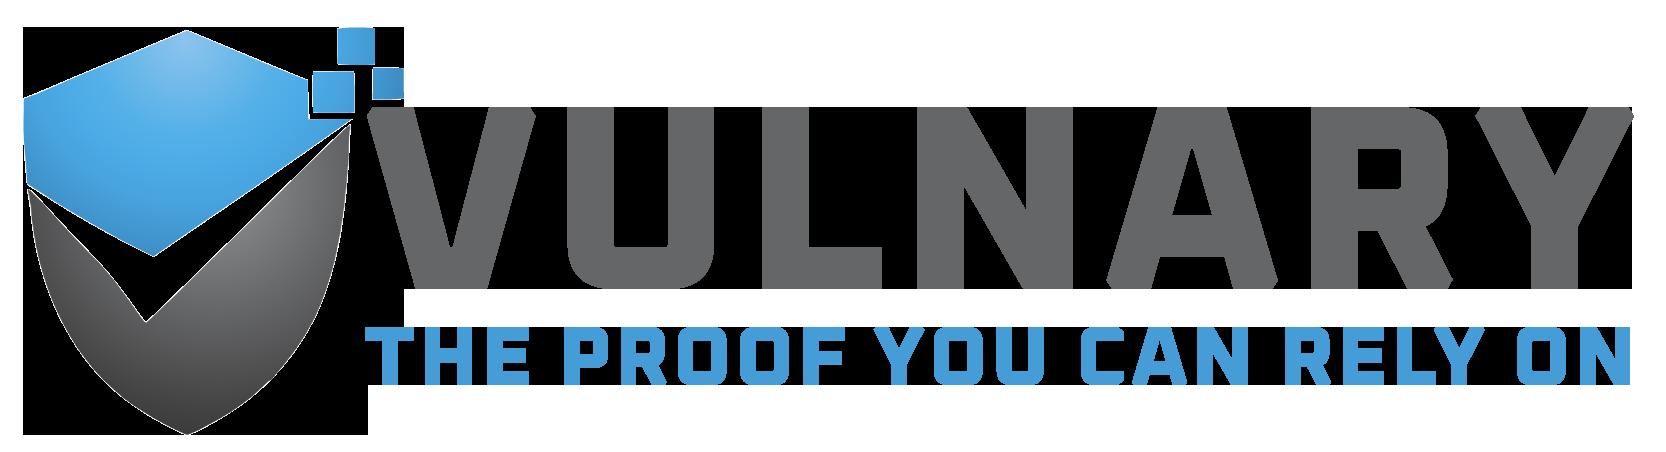 vulnary_logo_transp_web_small.png